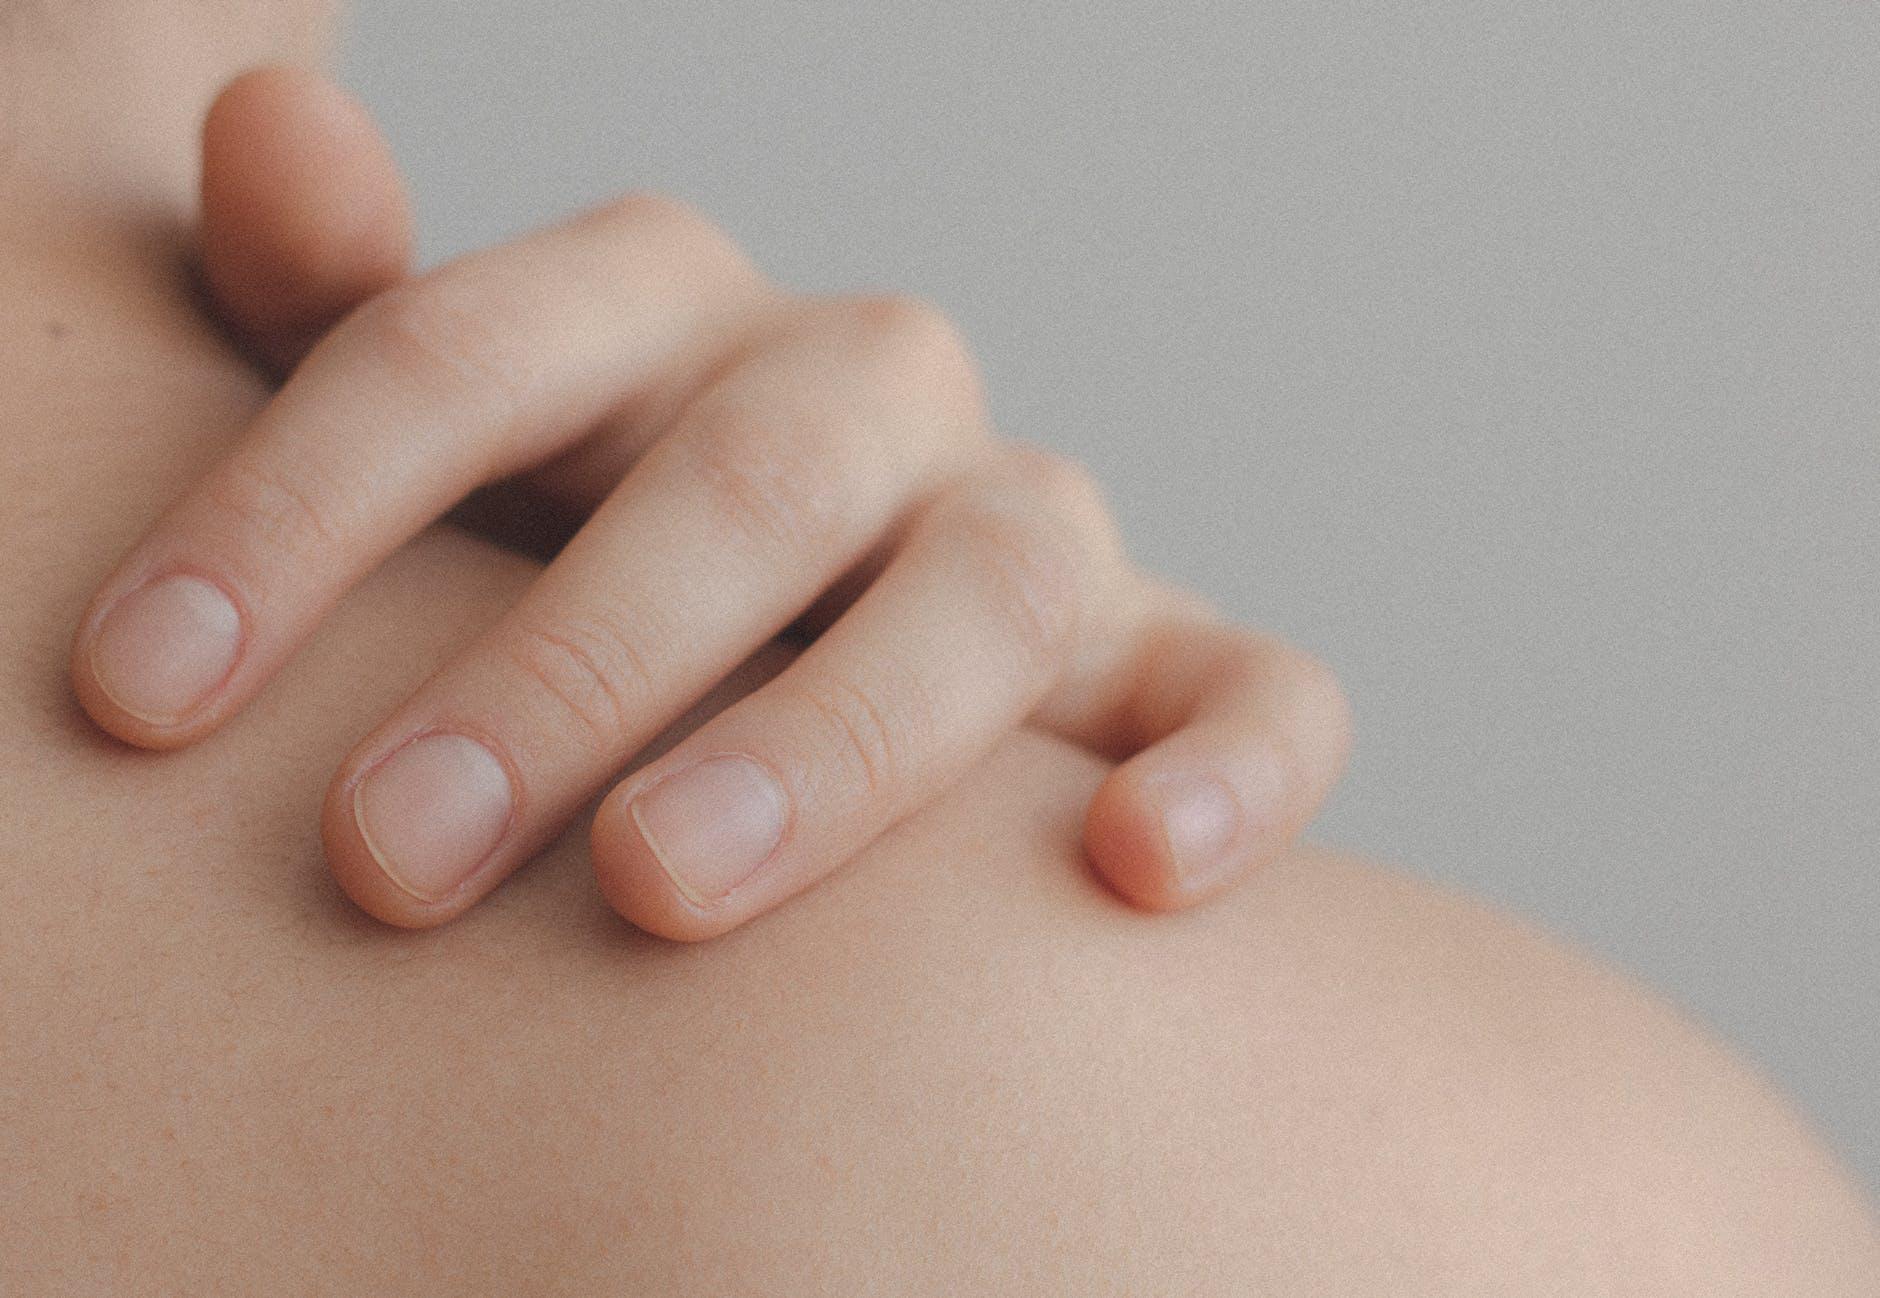 Piel sensible, atópica o alérgica, ¿cuál es cuál?